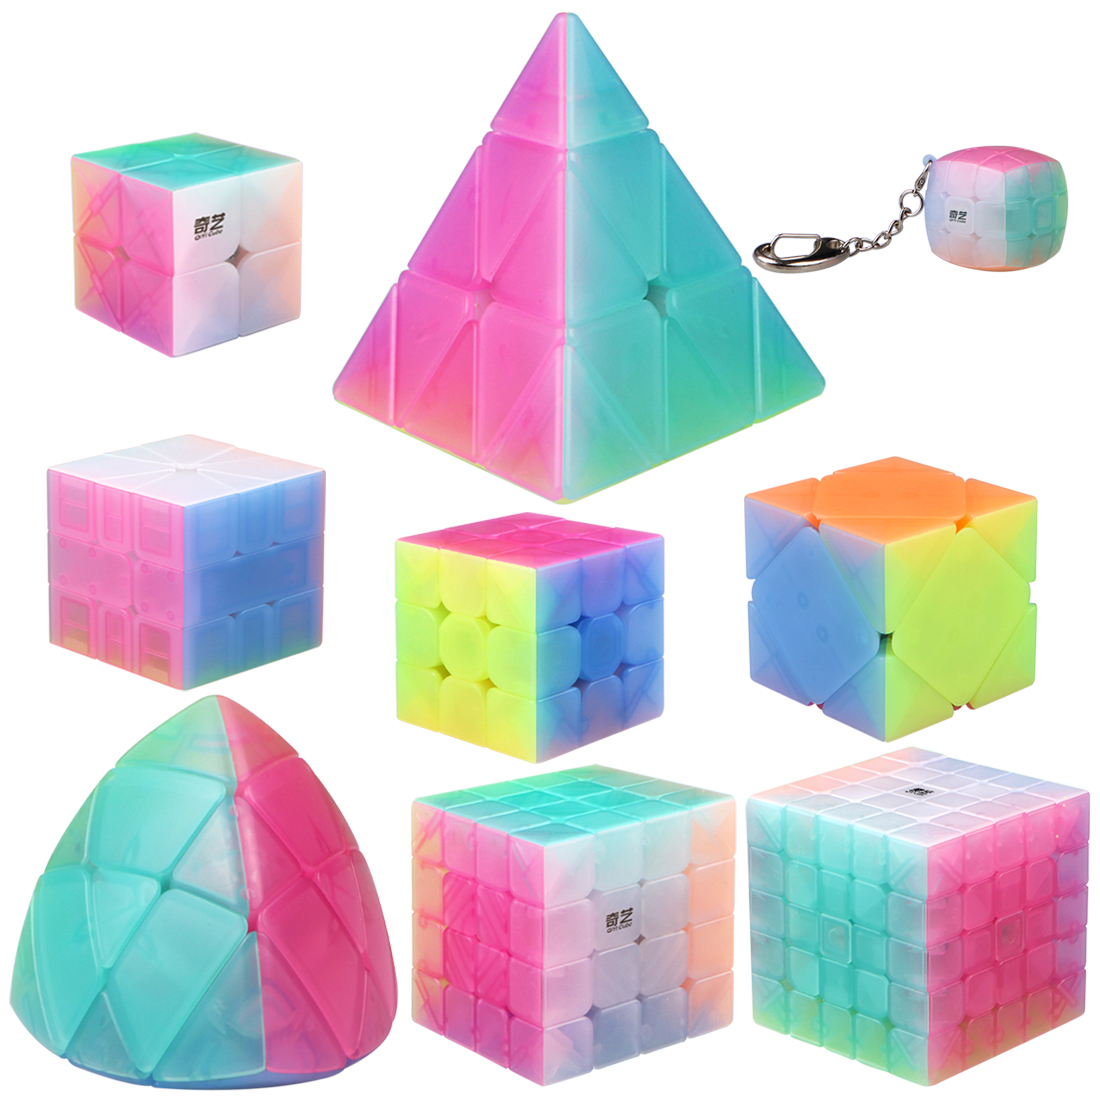 Girls Toys QiYi Jelly Cube Set Including Pyramid SQ-1 Mastermorphix 2x2 3x3 4x4 5x5 Magic Cube Kits Gift Package